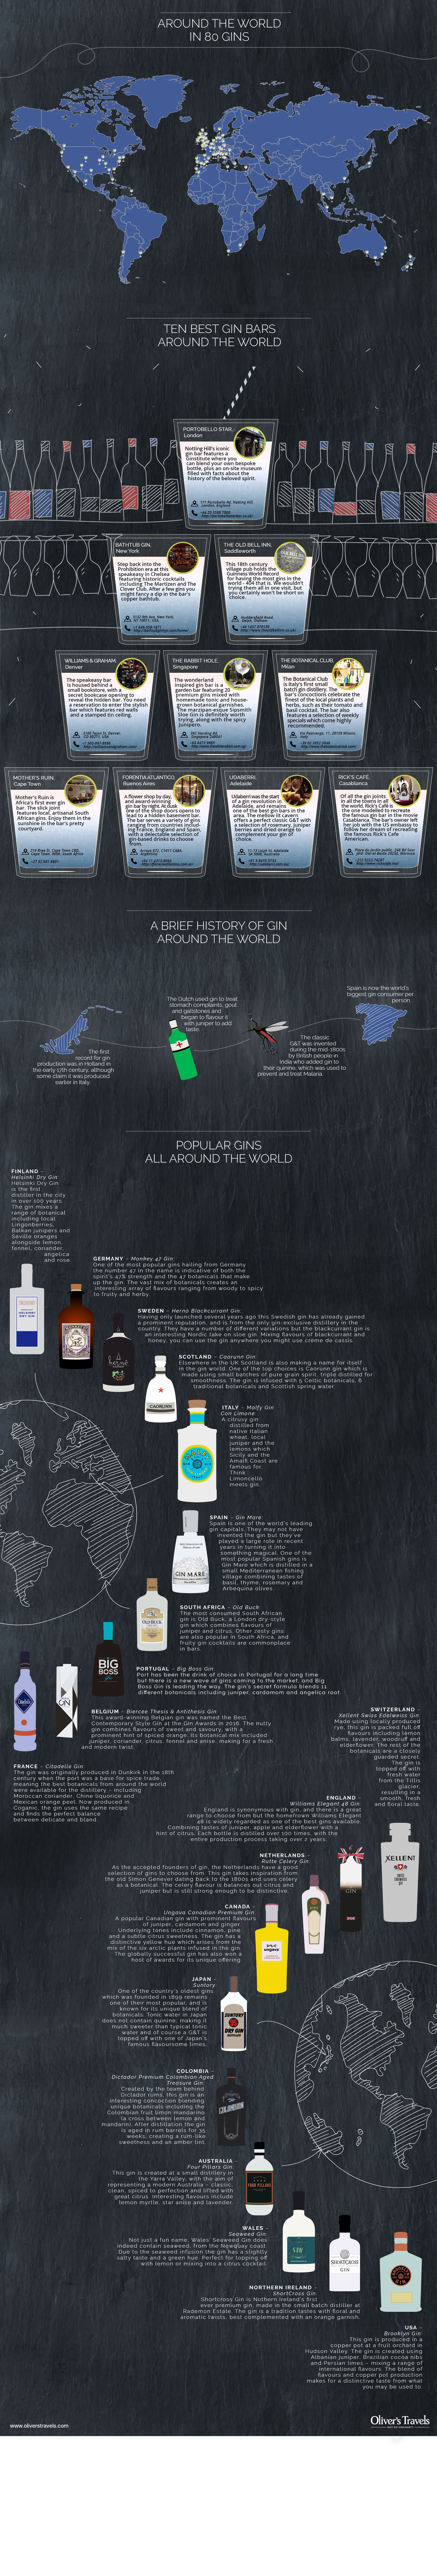 around the world in 80 gins world gin day